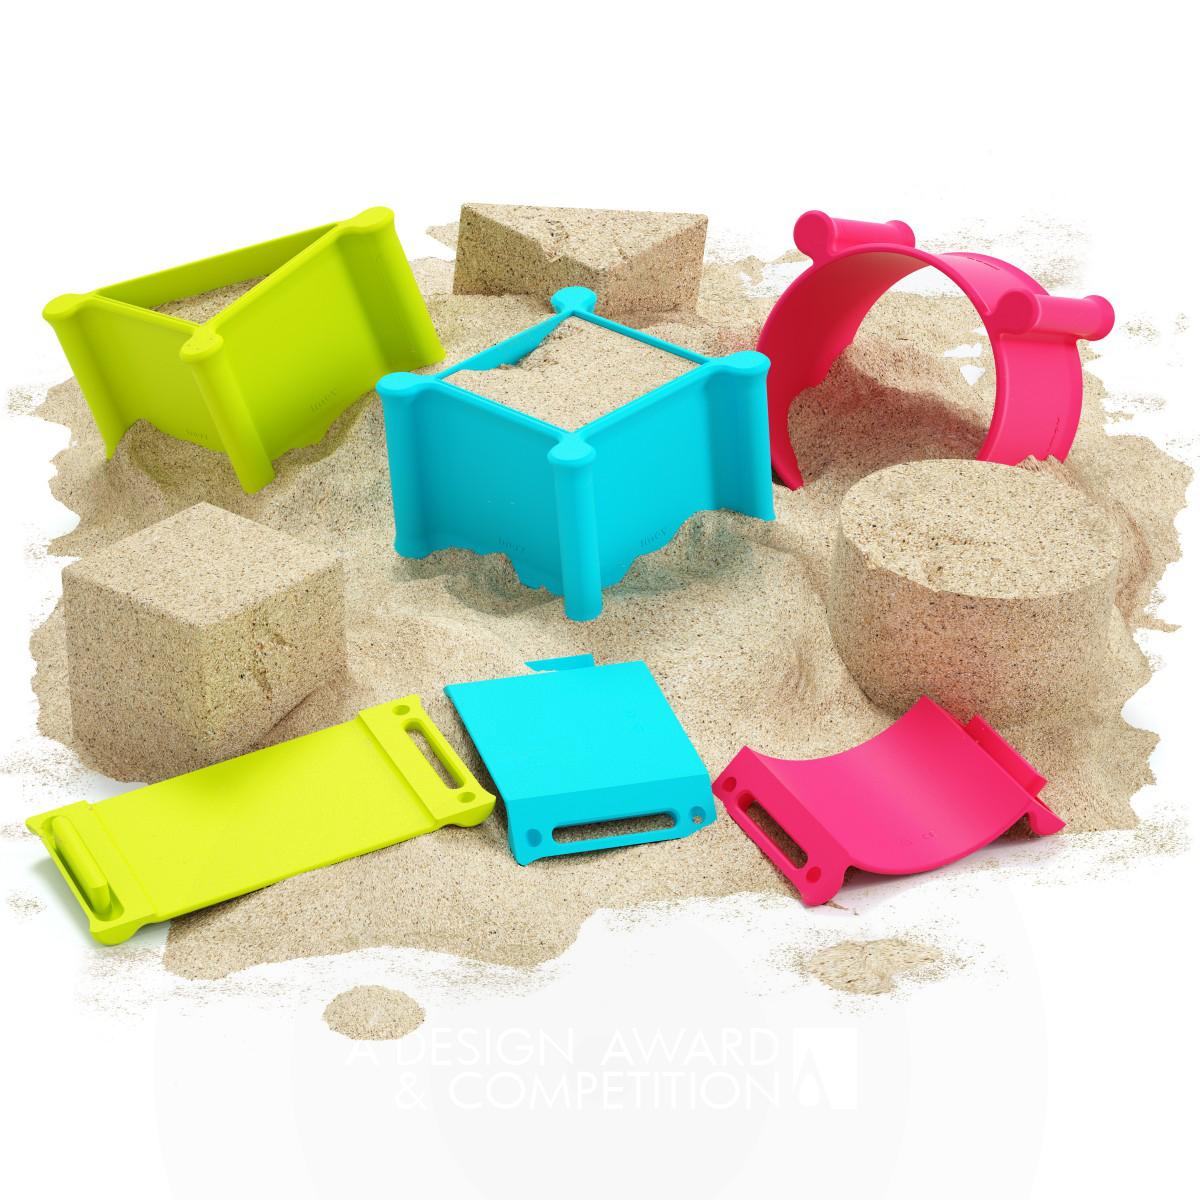 Kebrick Sand construction set